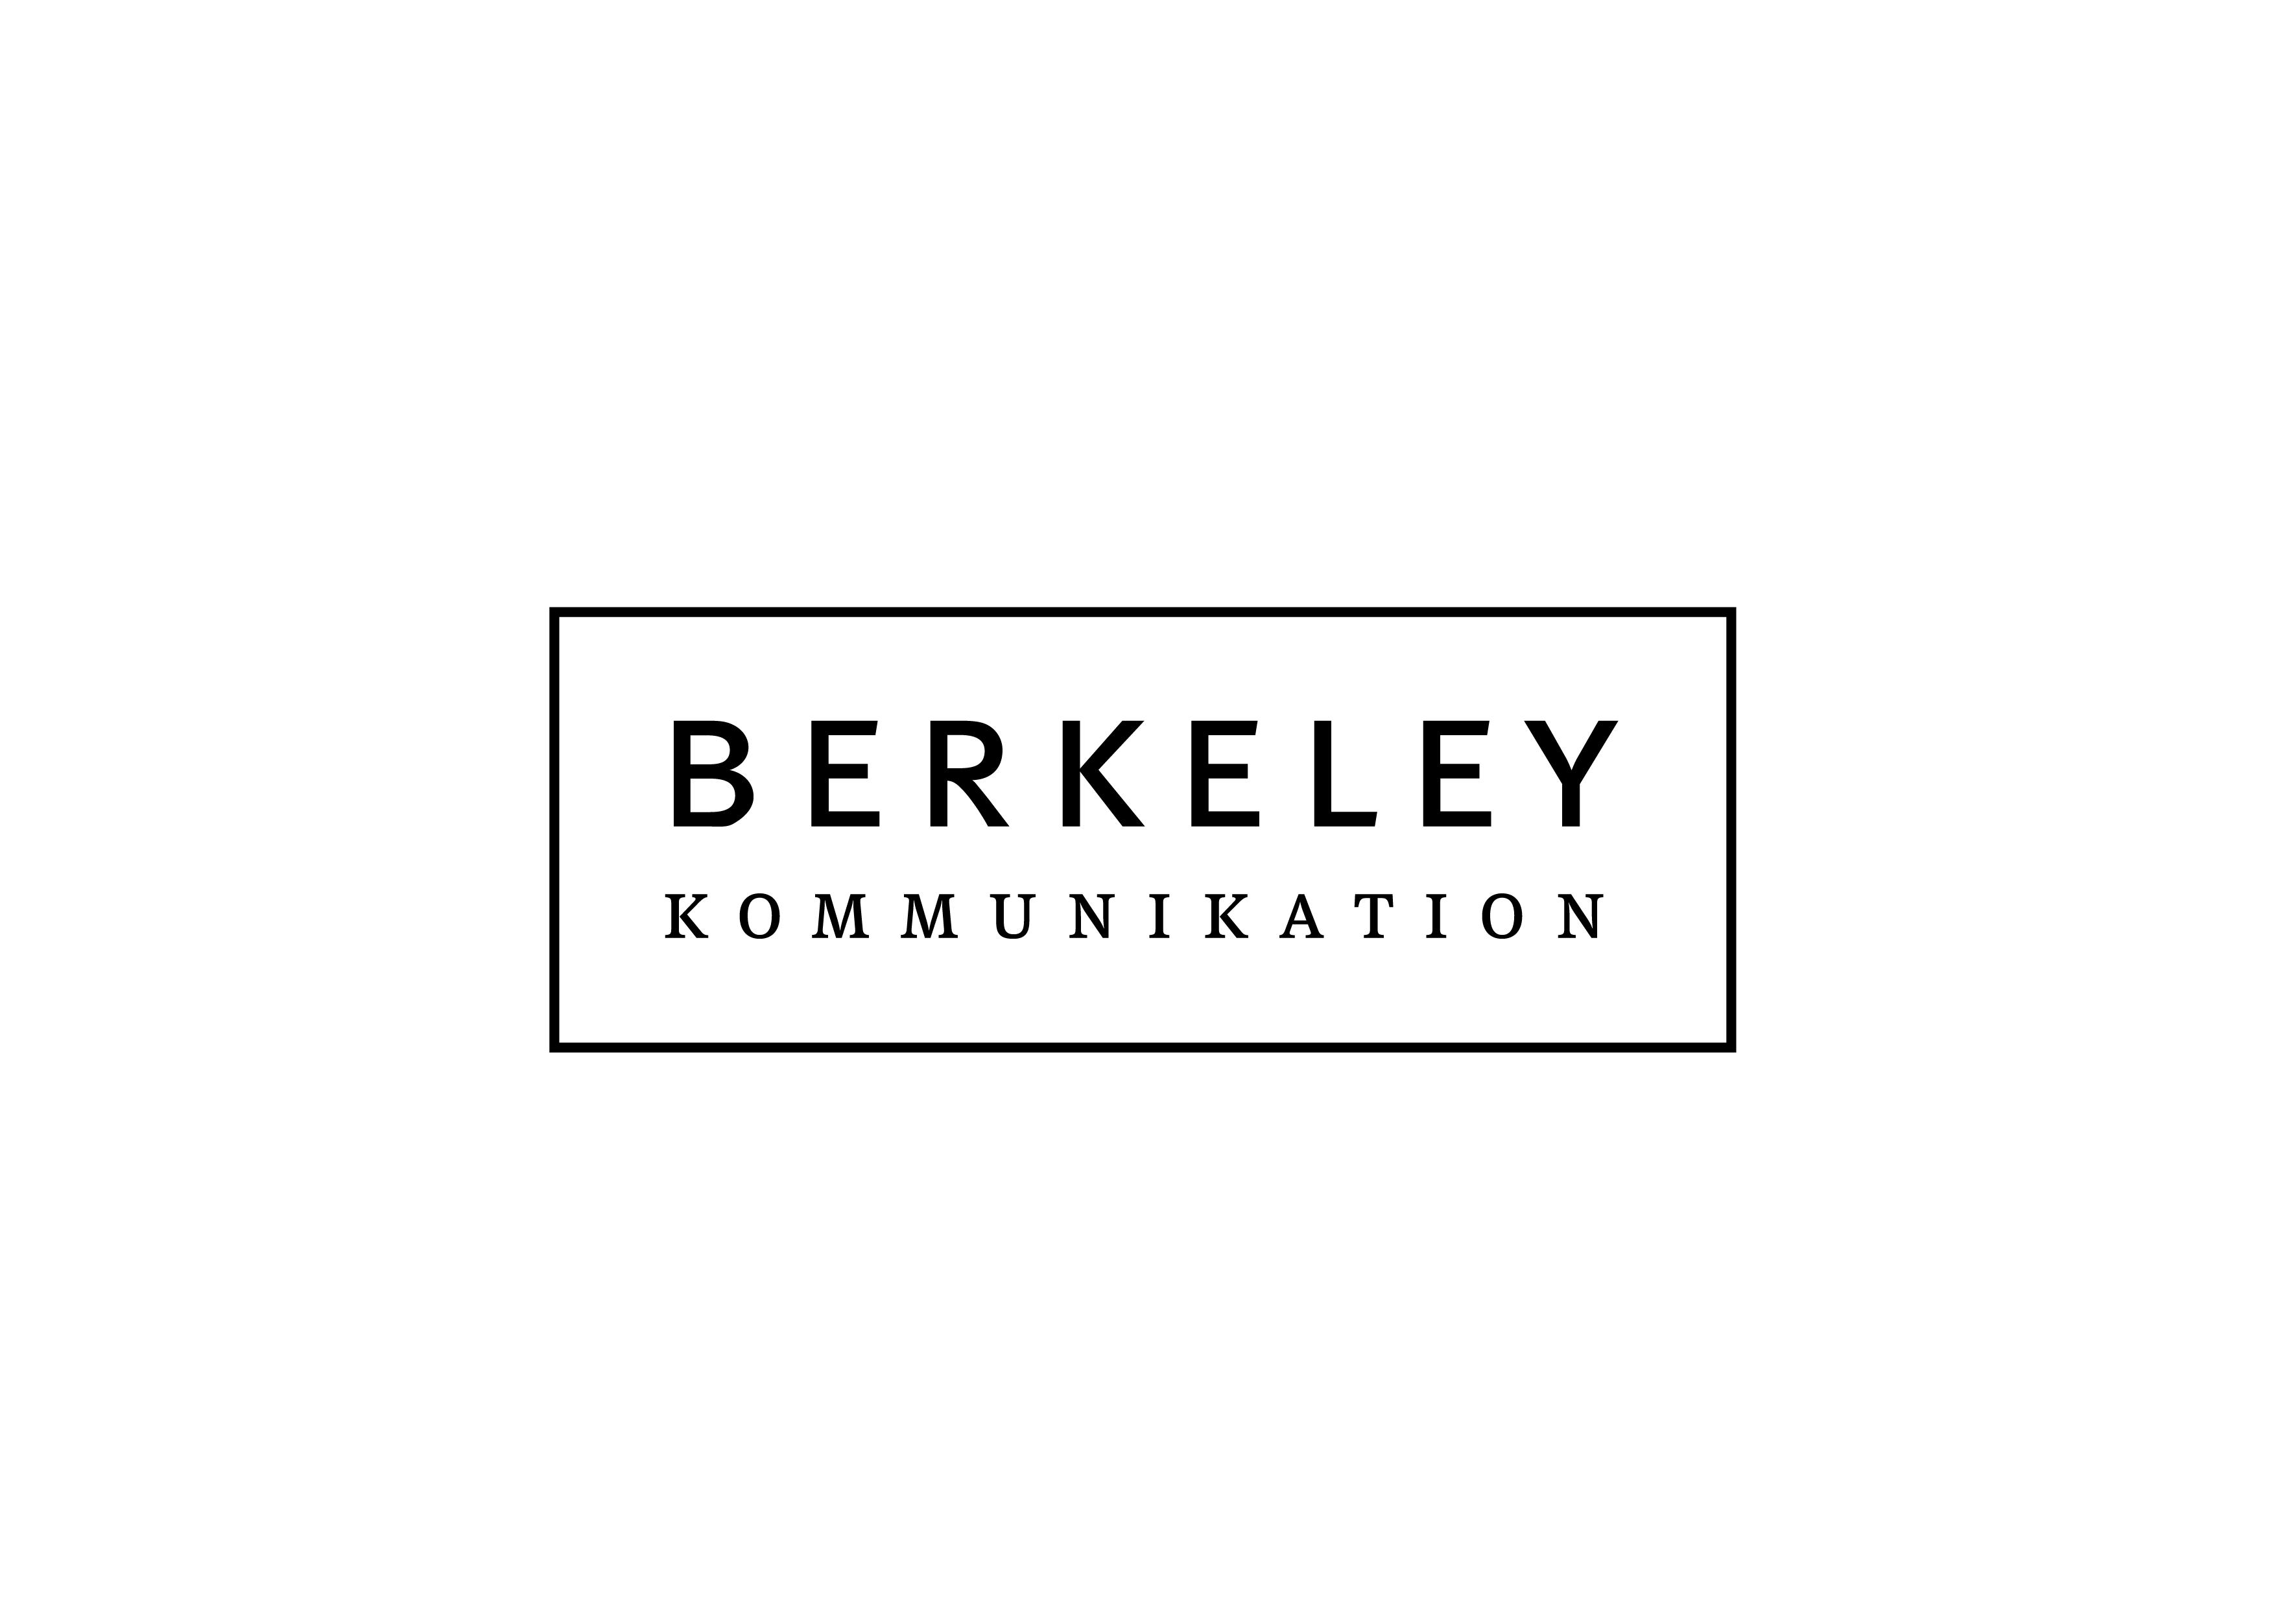 Berkeley Kommunikation Logo